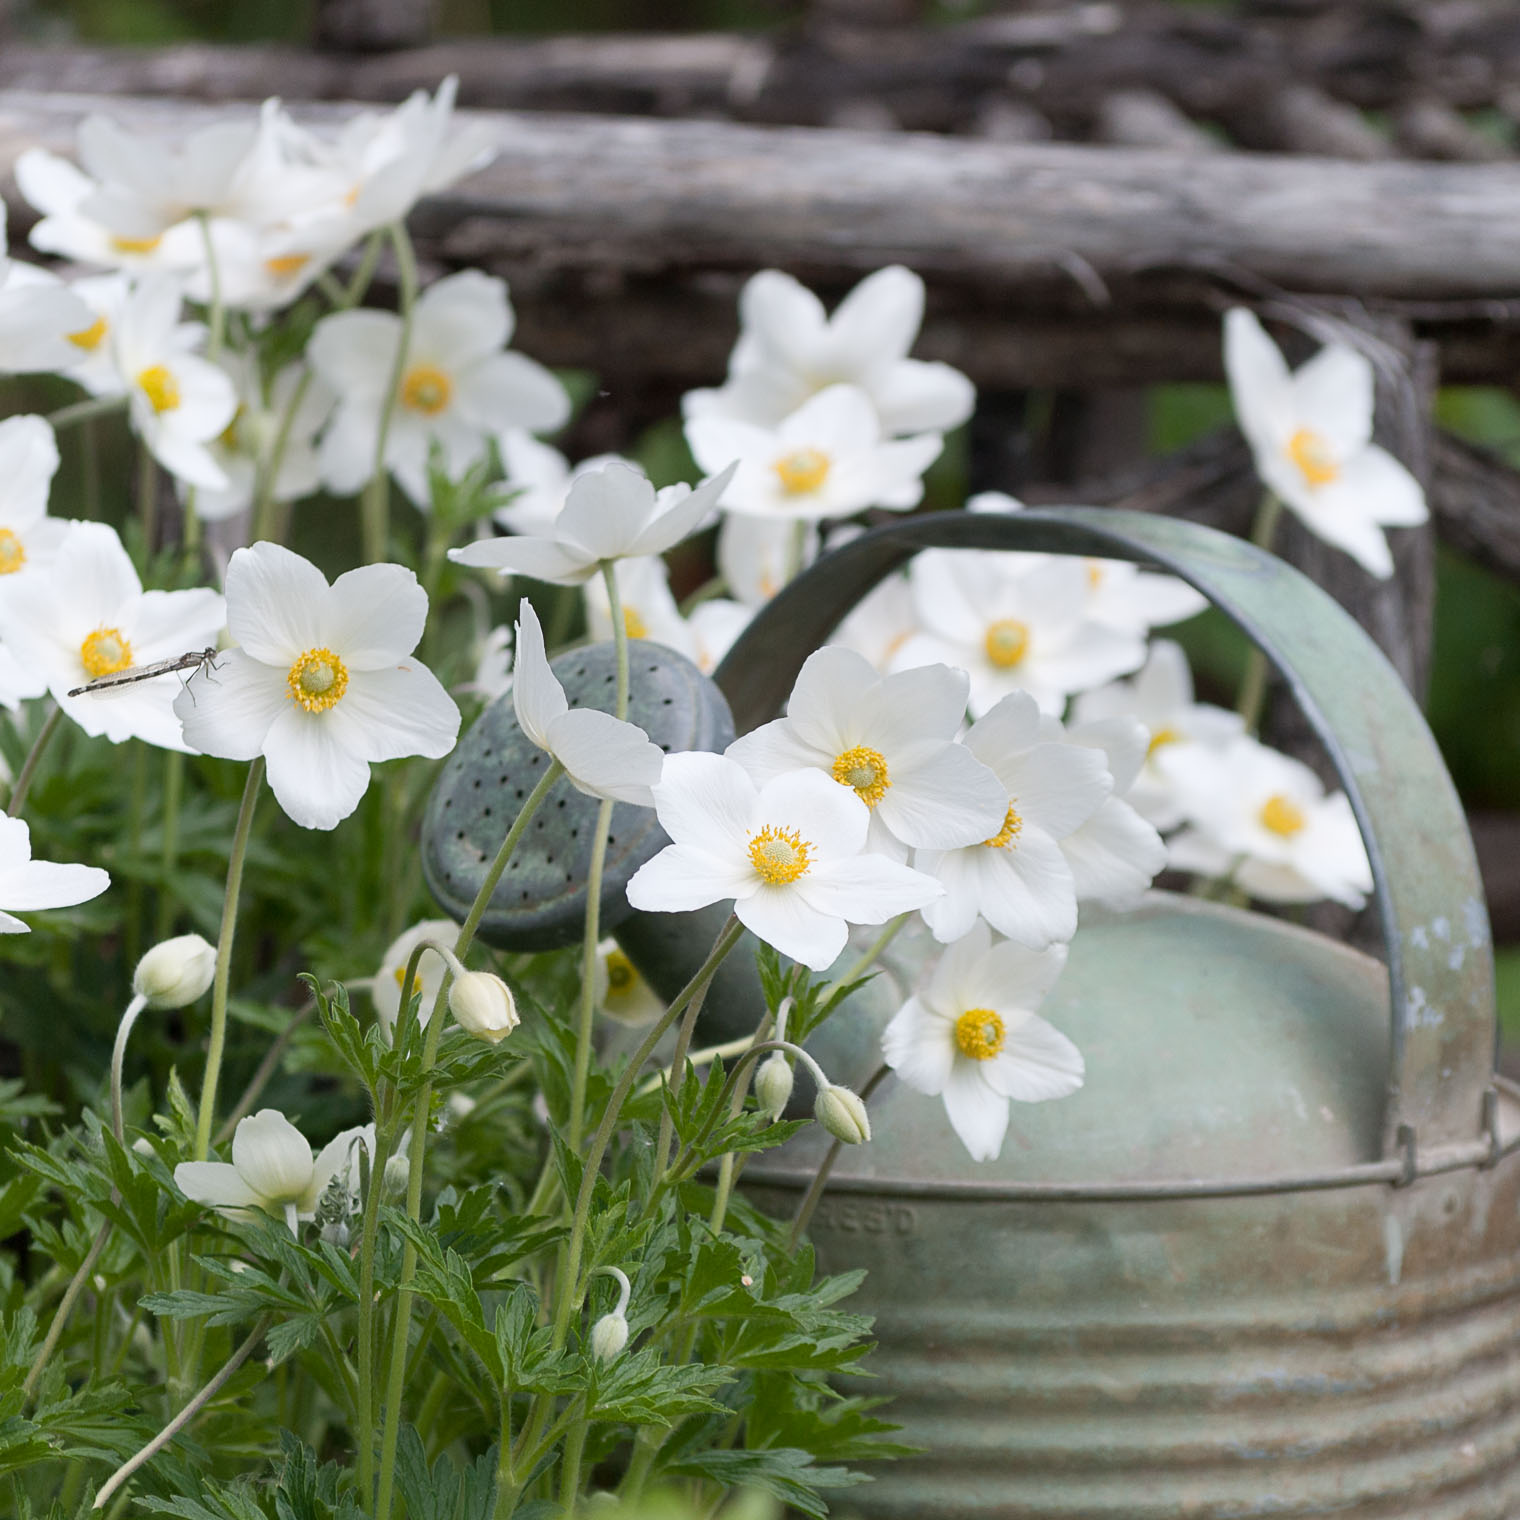 Hope Springs Eternal, Anemone Bulbs, Still Life, Flatlay, Barb Brookbank